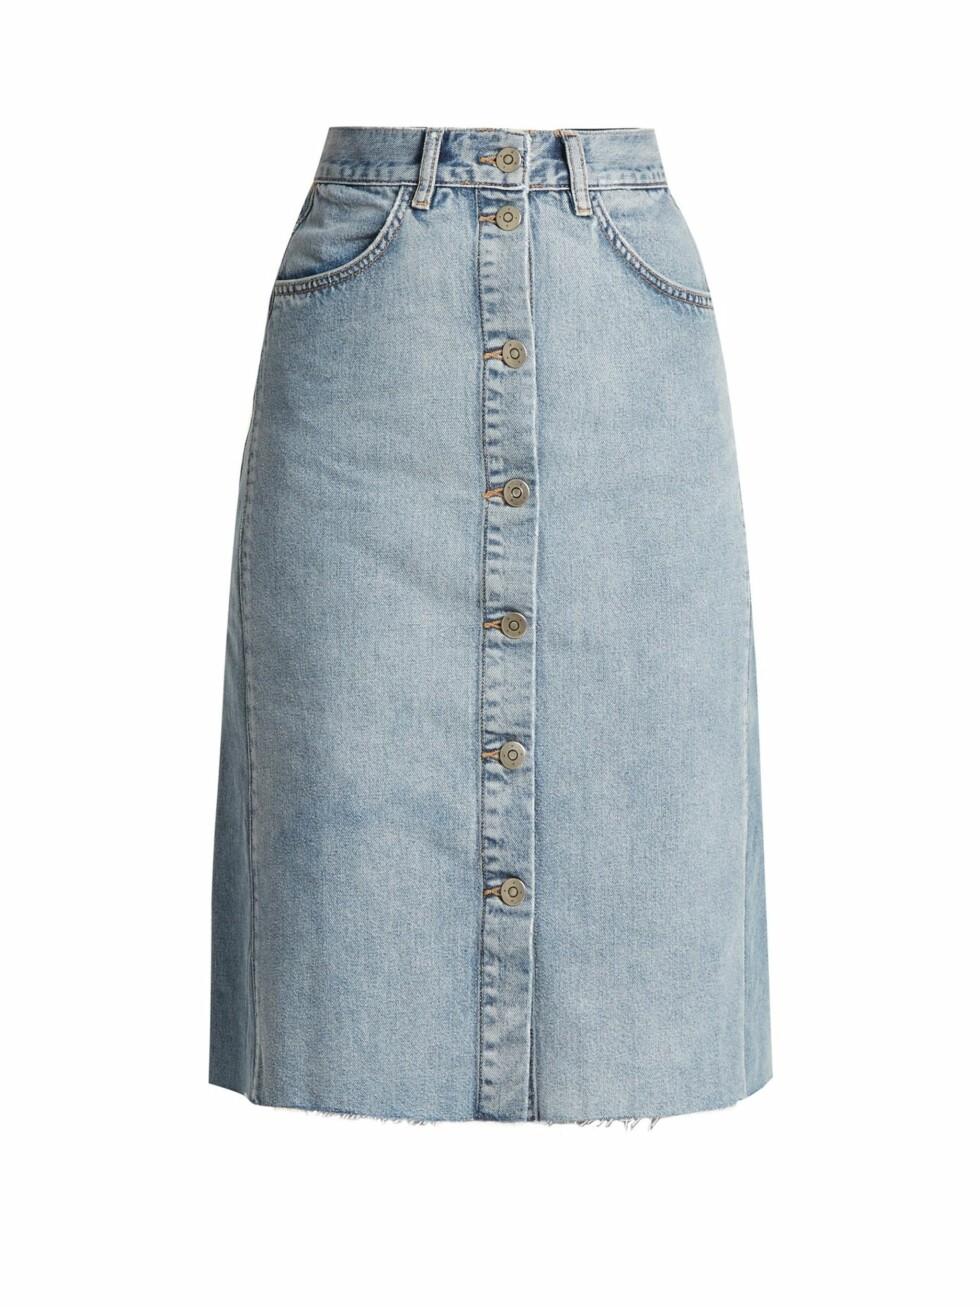 Skjørt fra Mih Jeans |885,-| https://www.matchesfashion.com/intl/products/A-P-C--Patch-pocket-denim-skirt--1037518